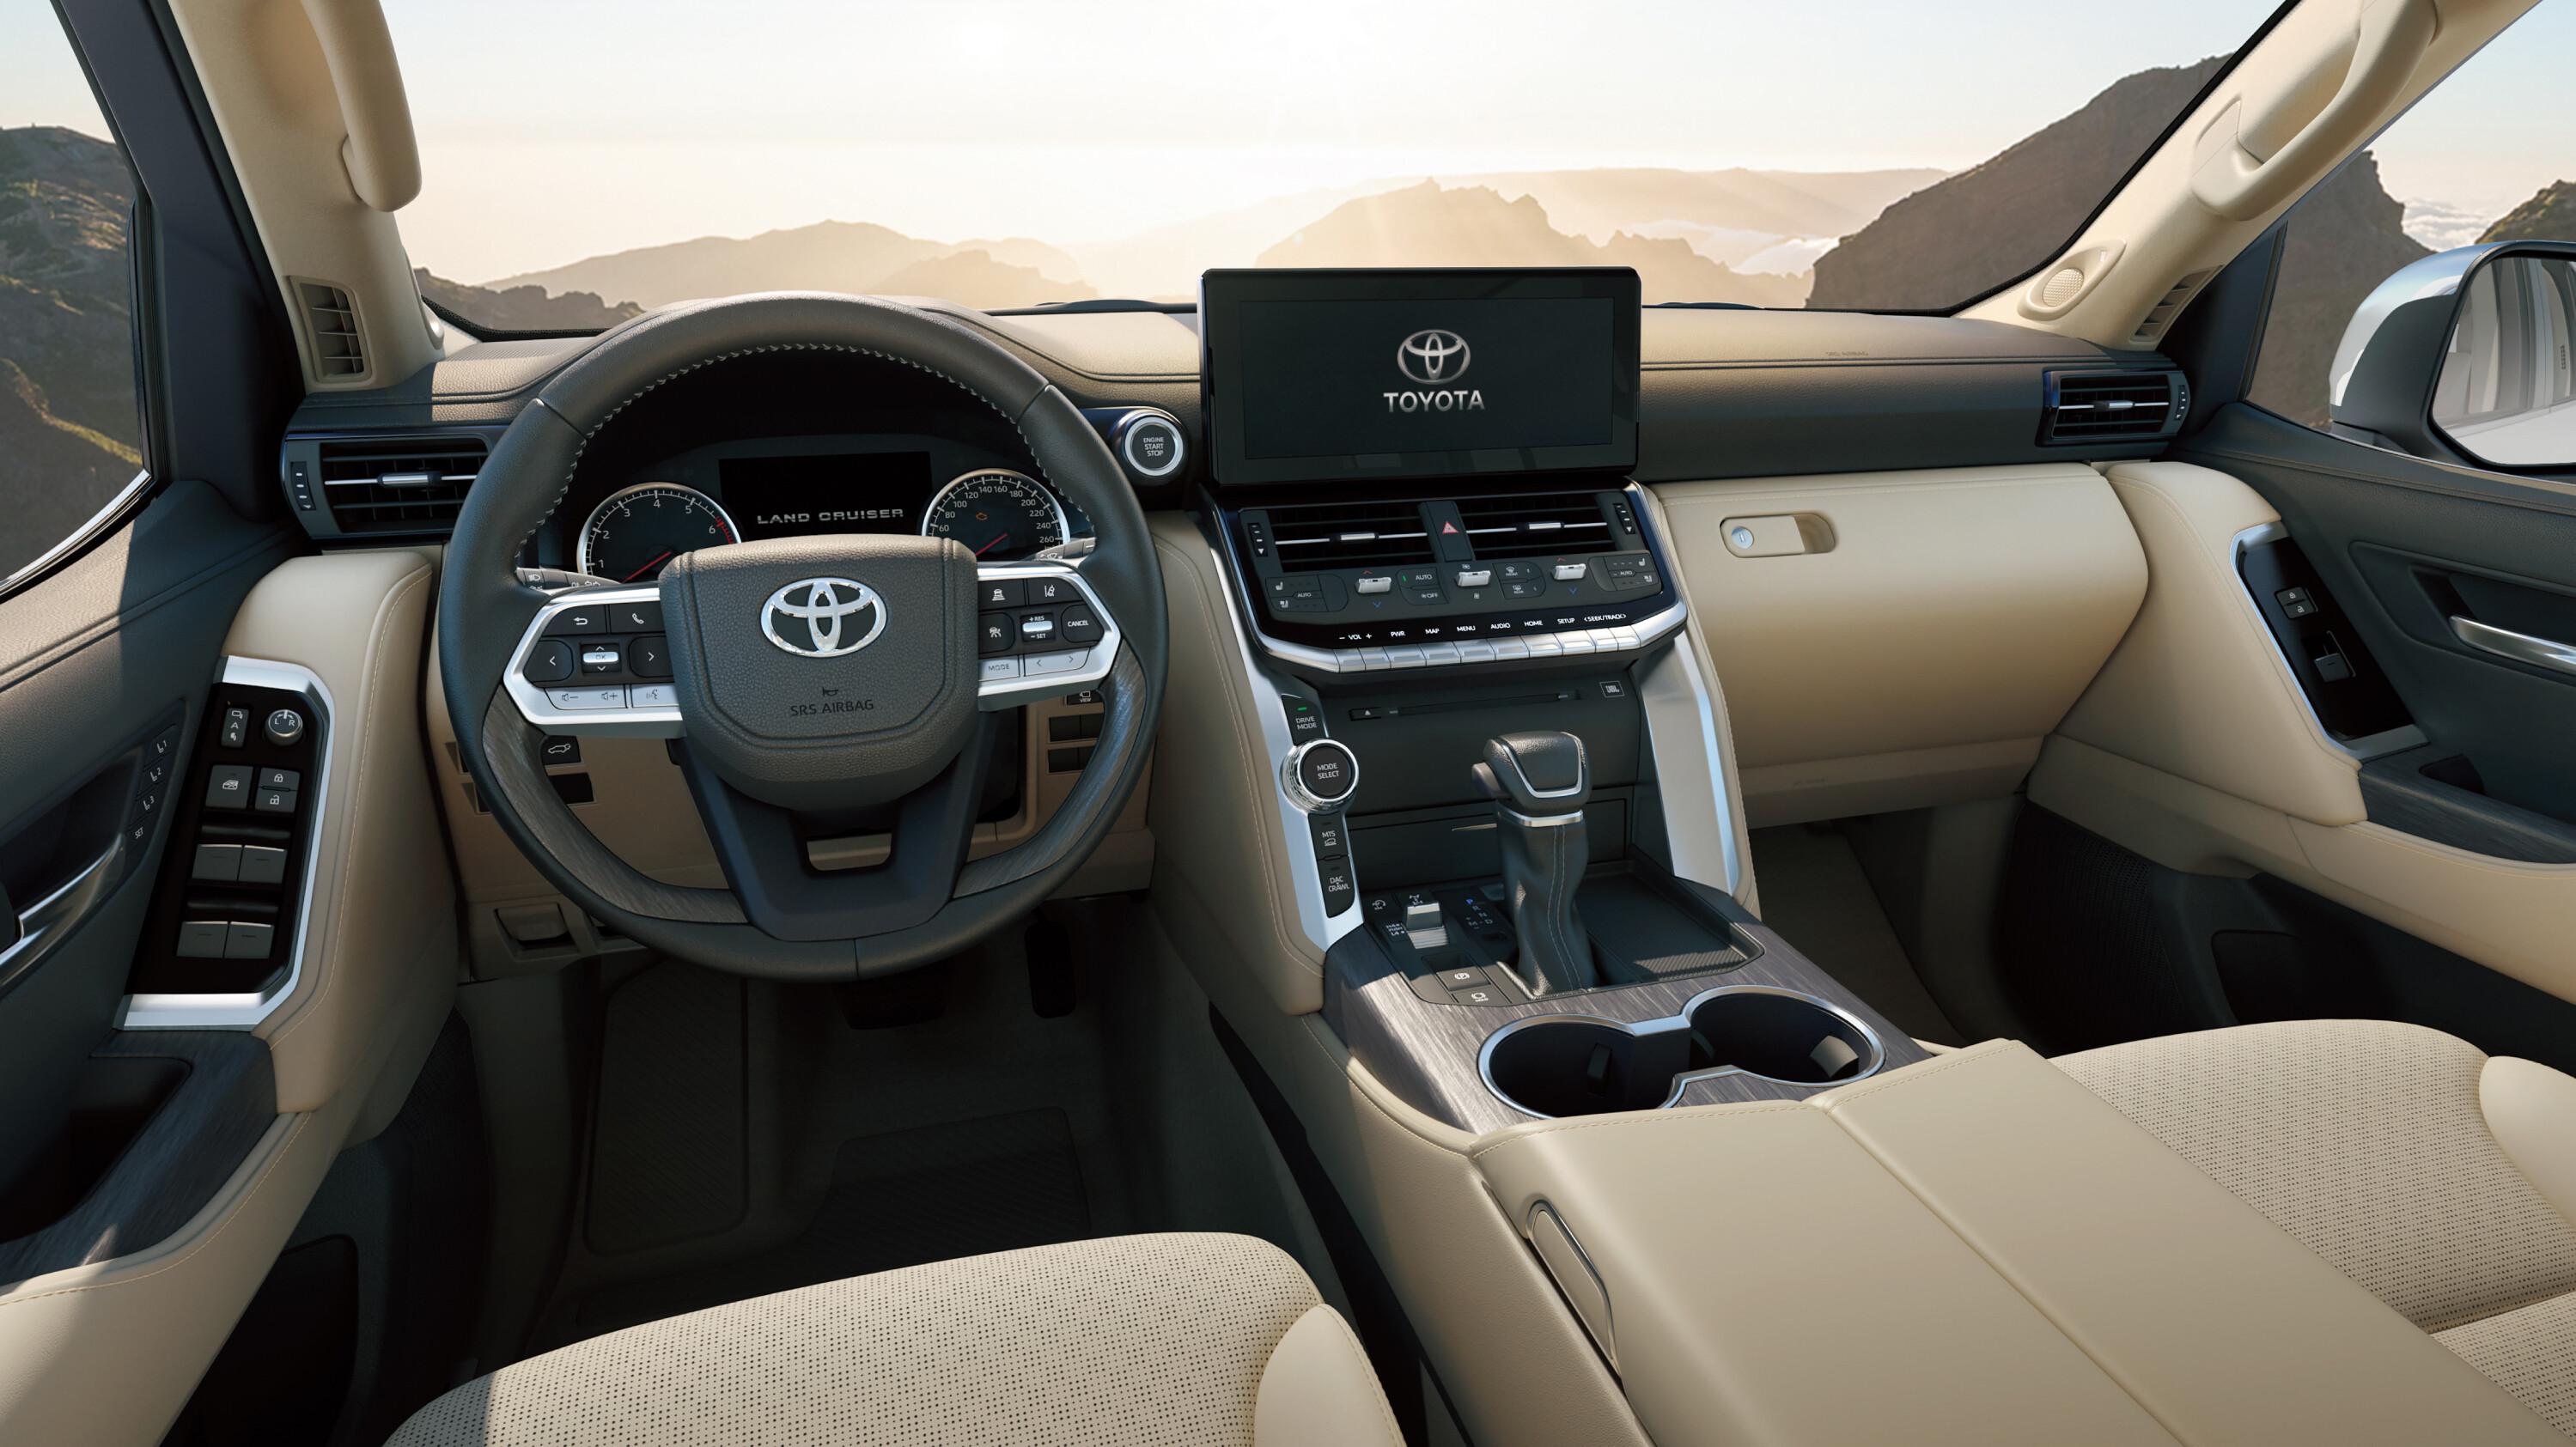 News 2022 Toyota Land Cruiser 300 Series Interior